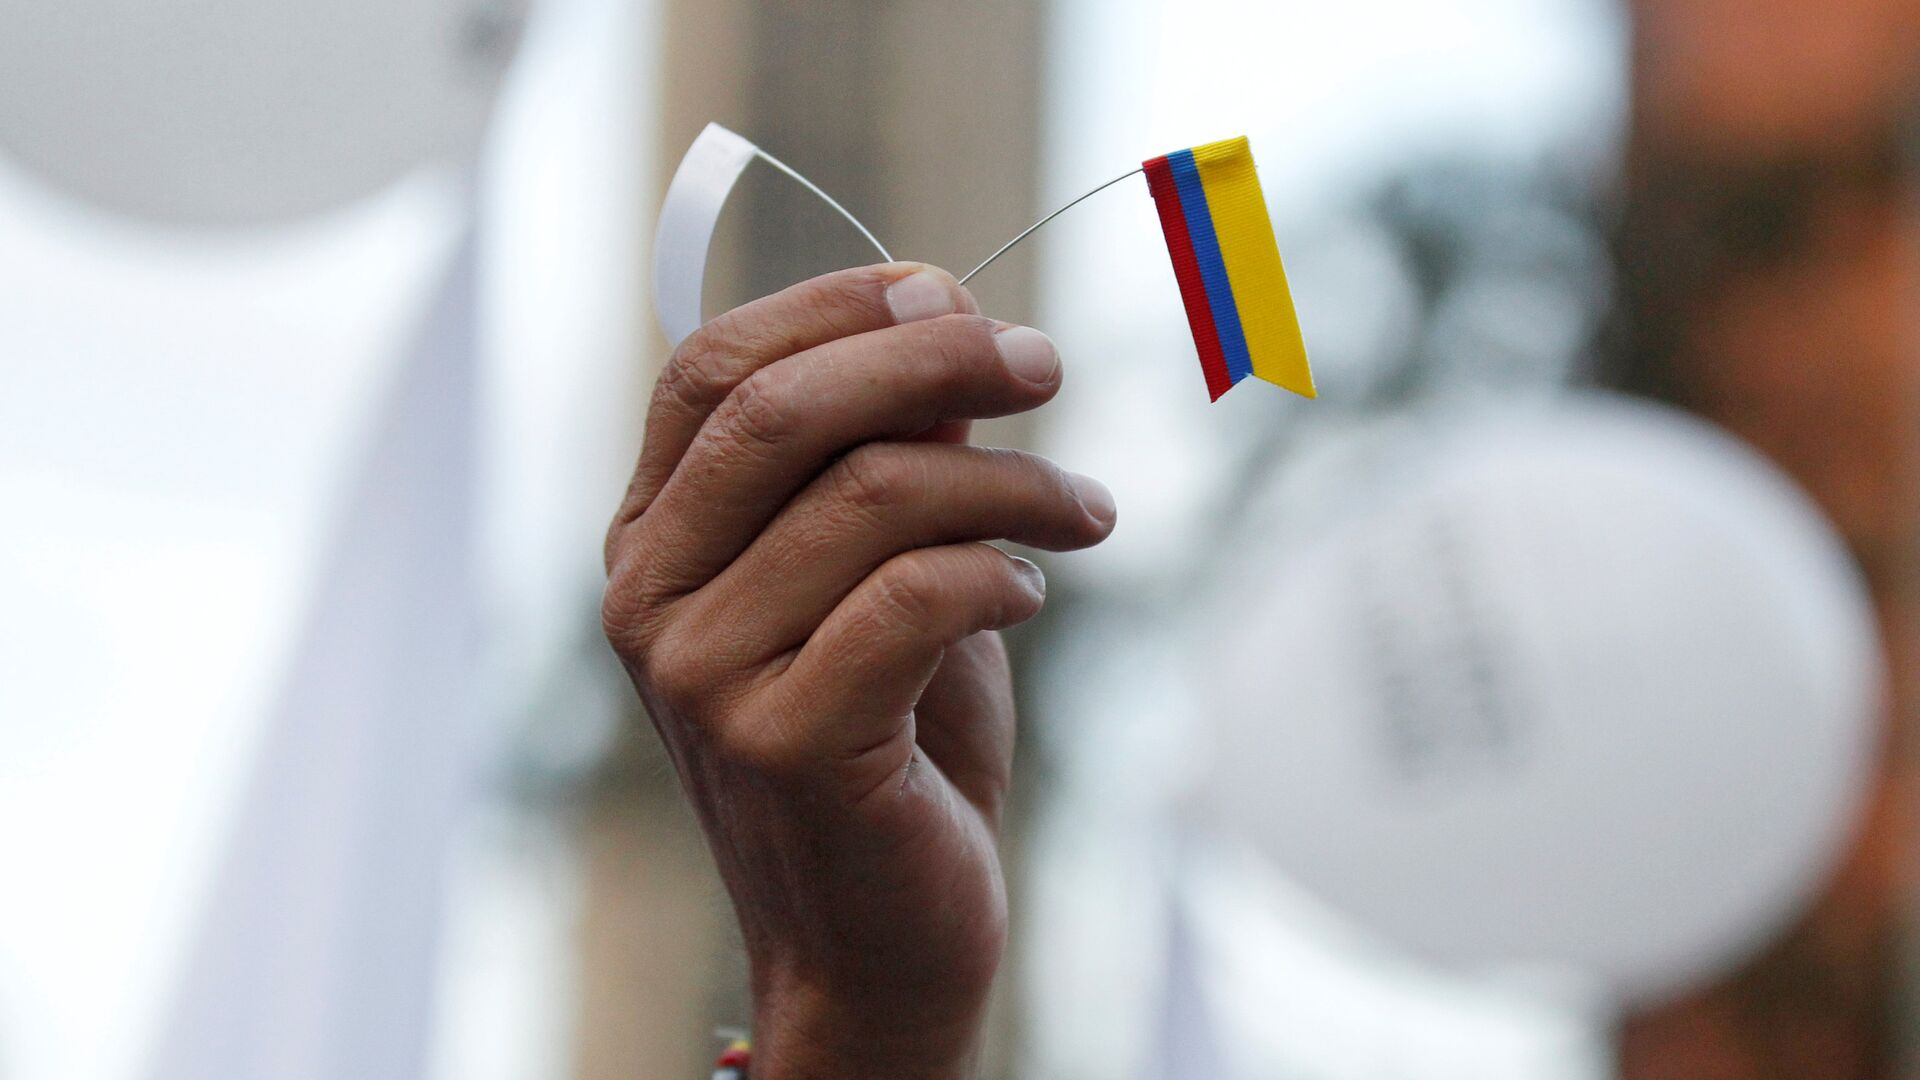 Símbolo de paz con FARC en Colombia - Sputnik Mundo, 1920, 14.09.2021